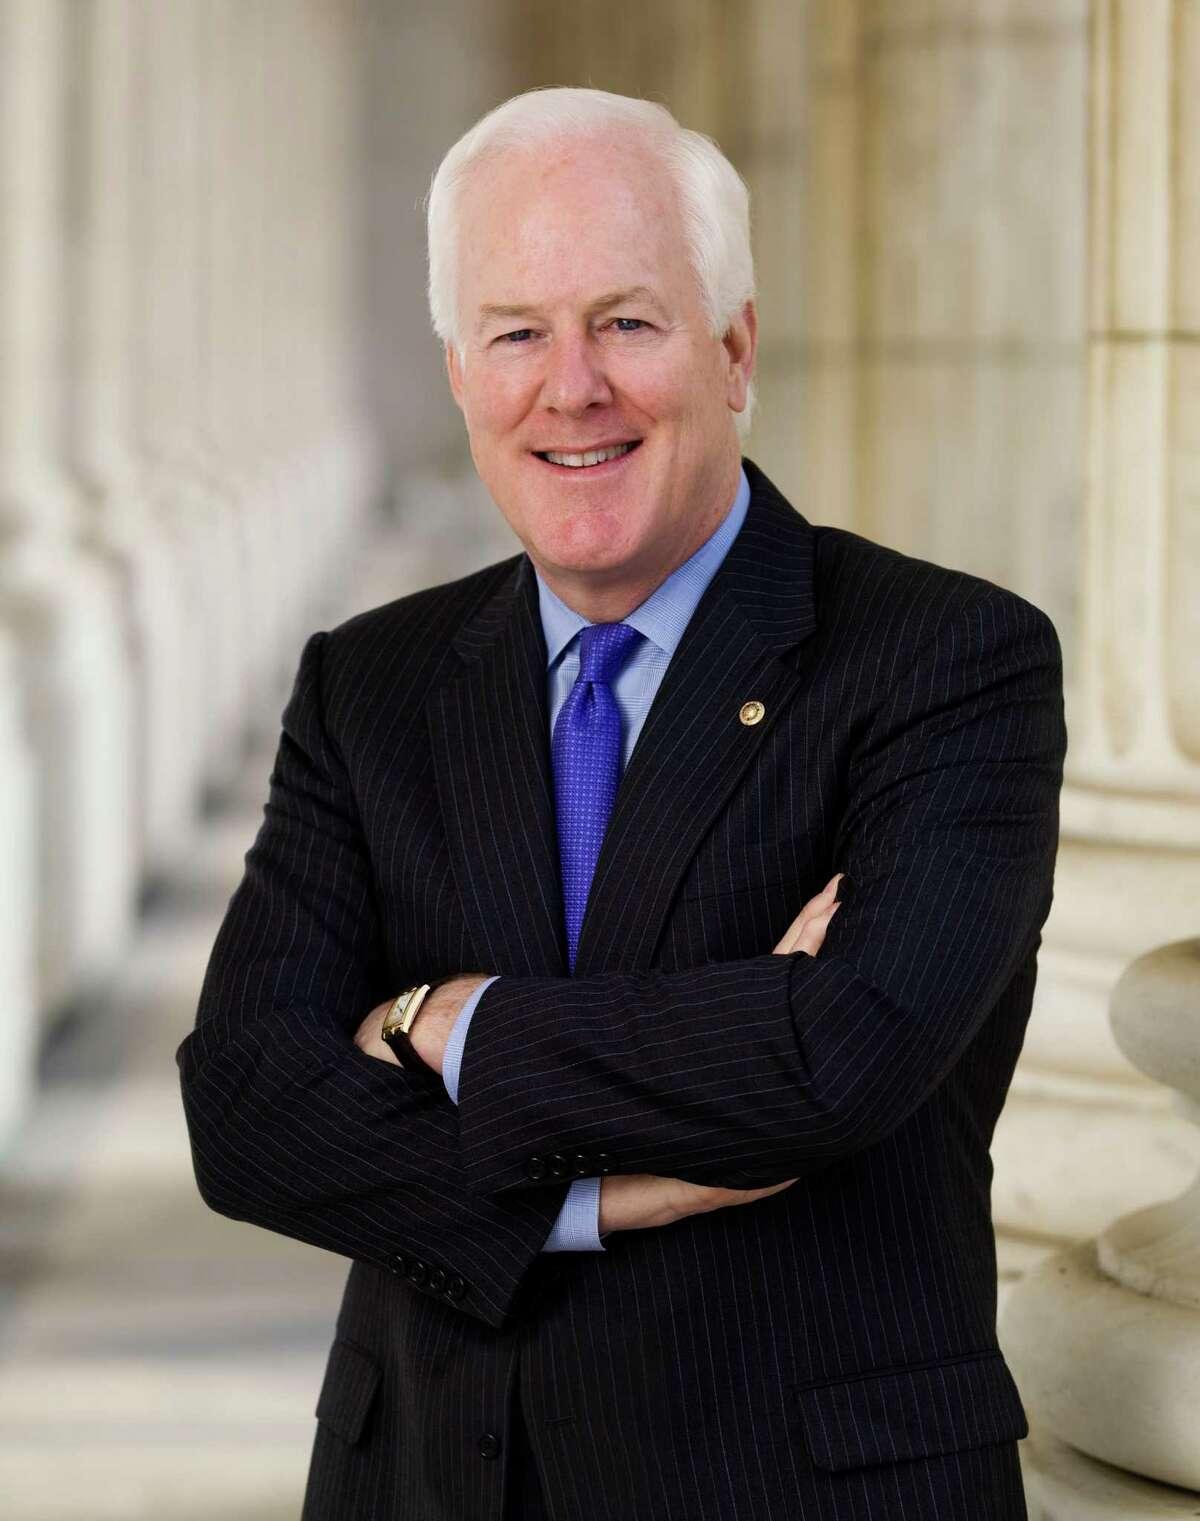 U.S. Sen. John Cornyn will speak at the Fort Bend Strong event.